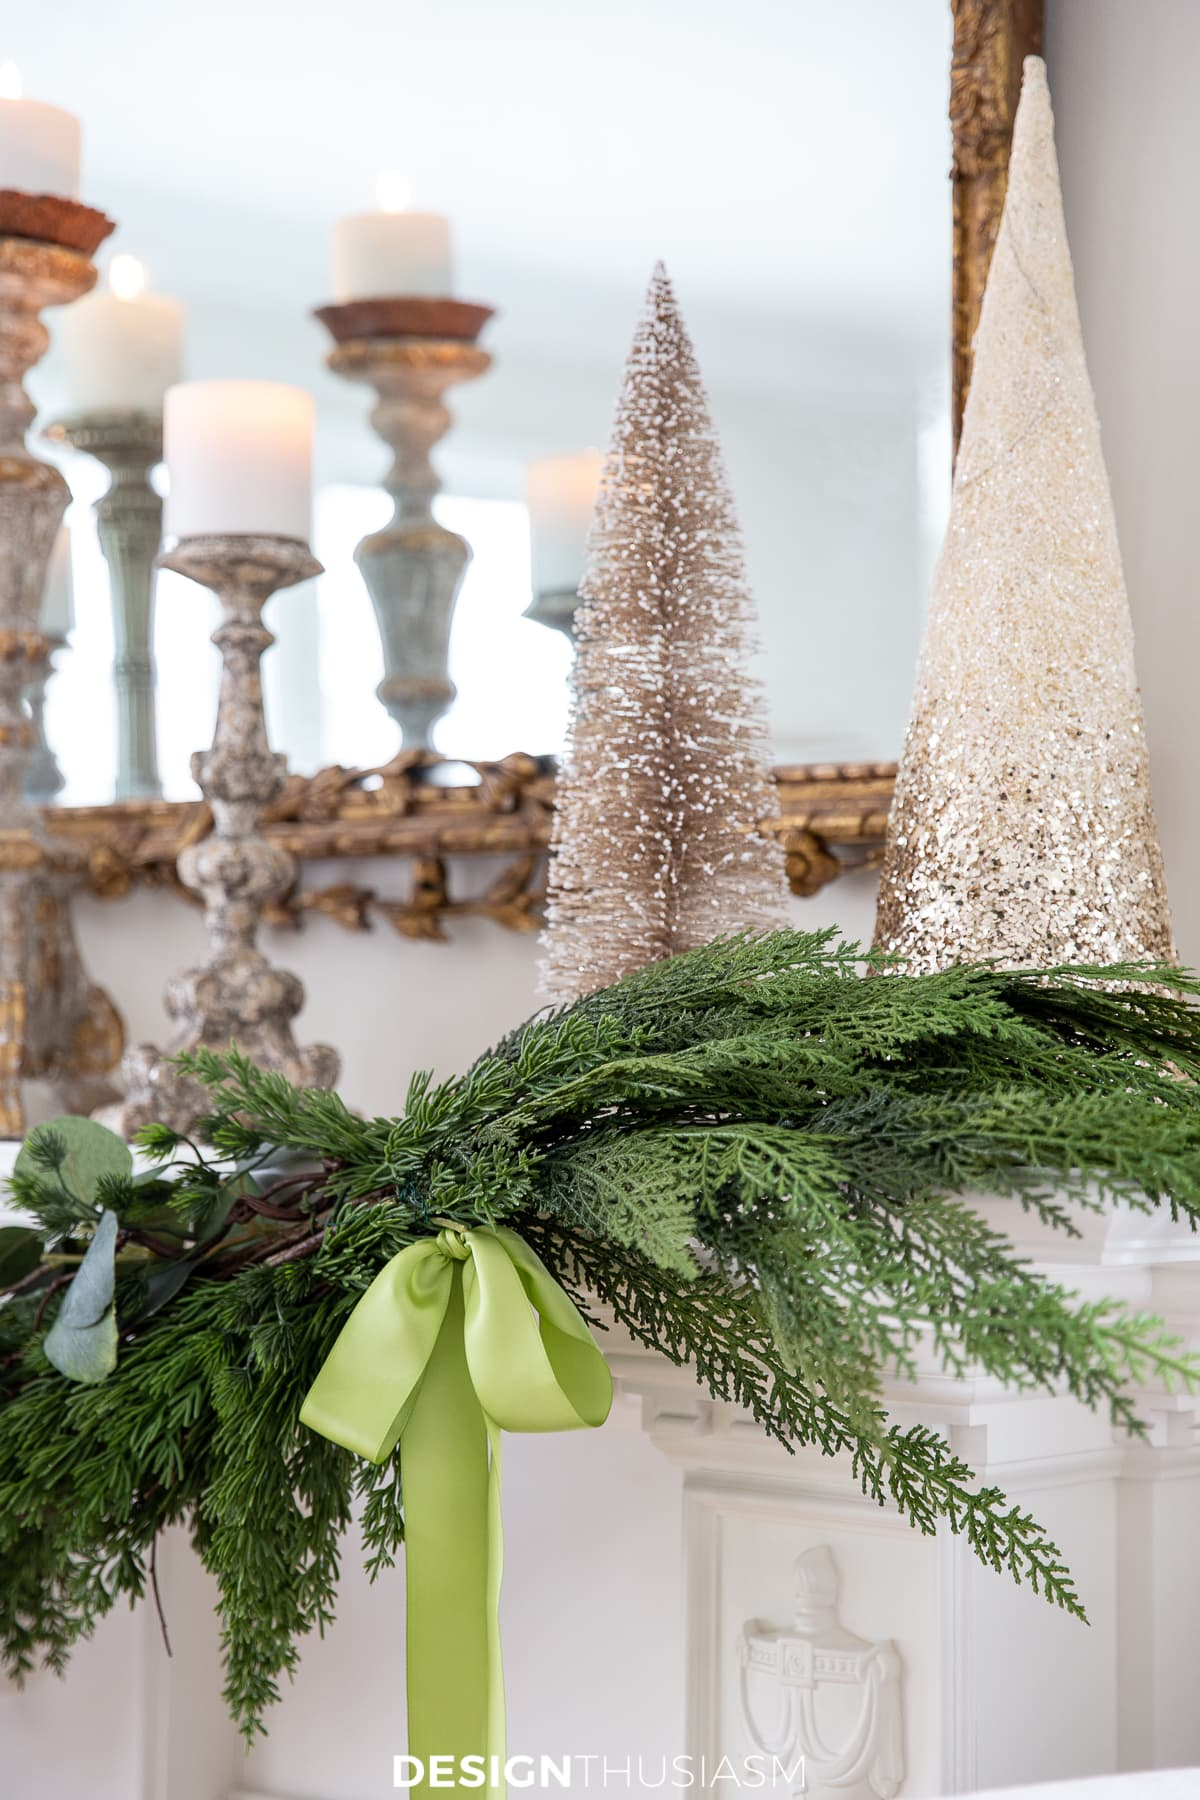 Christmas Mantel Decor Adding Holiday Cheer With A Mantel Garland